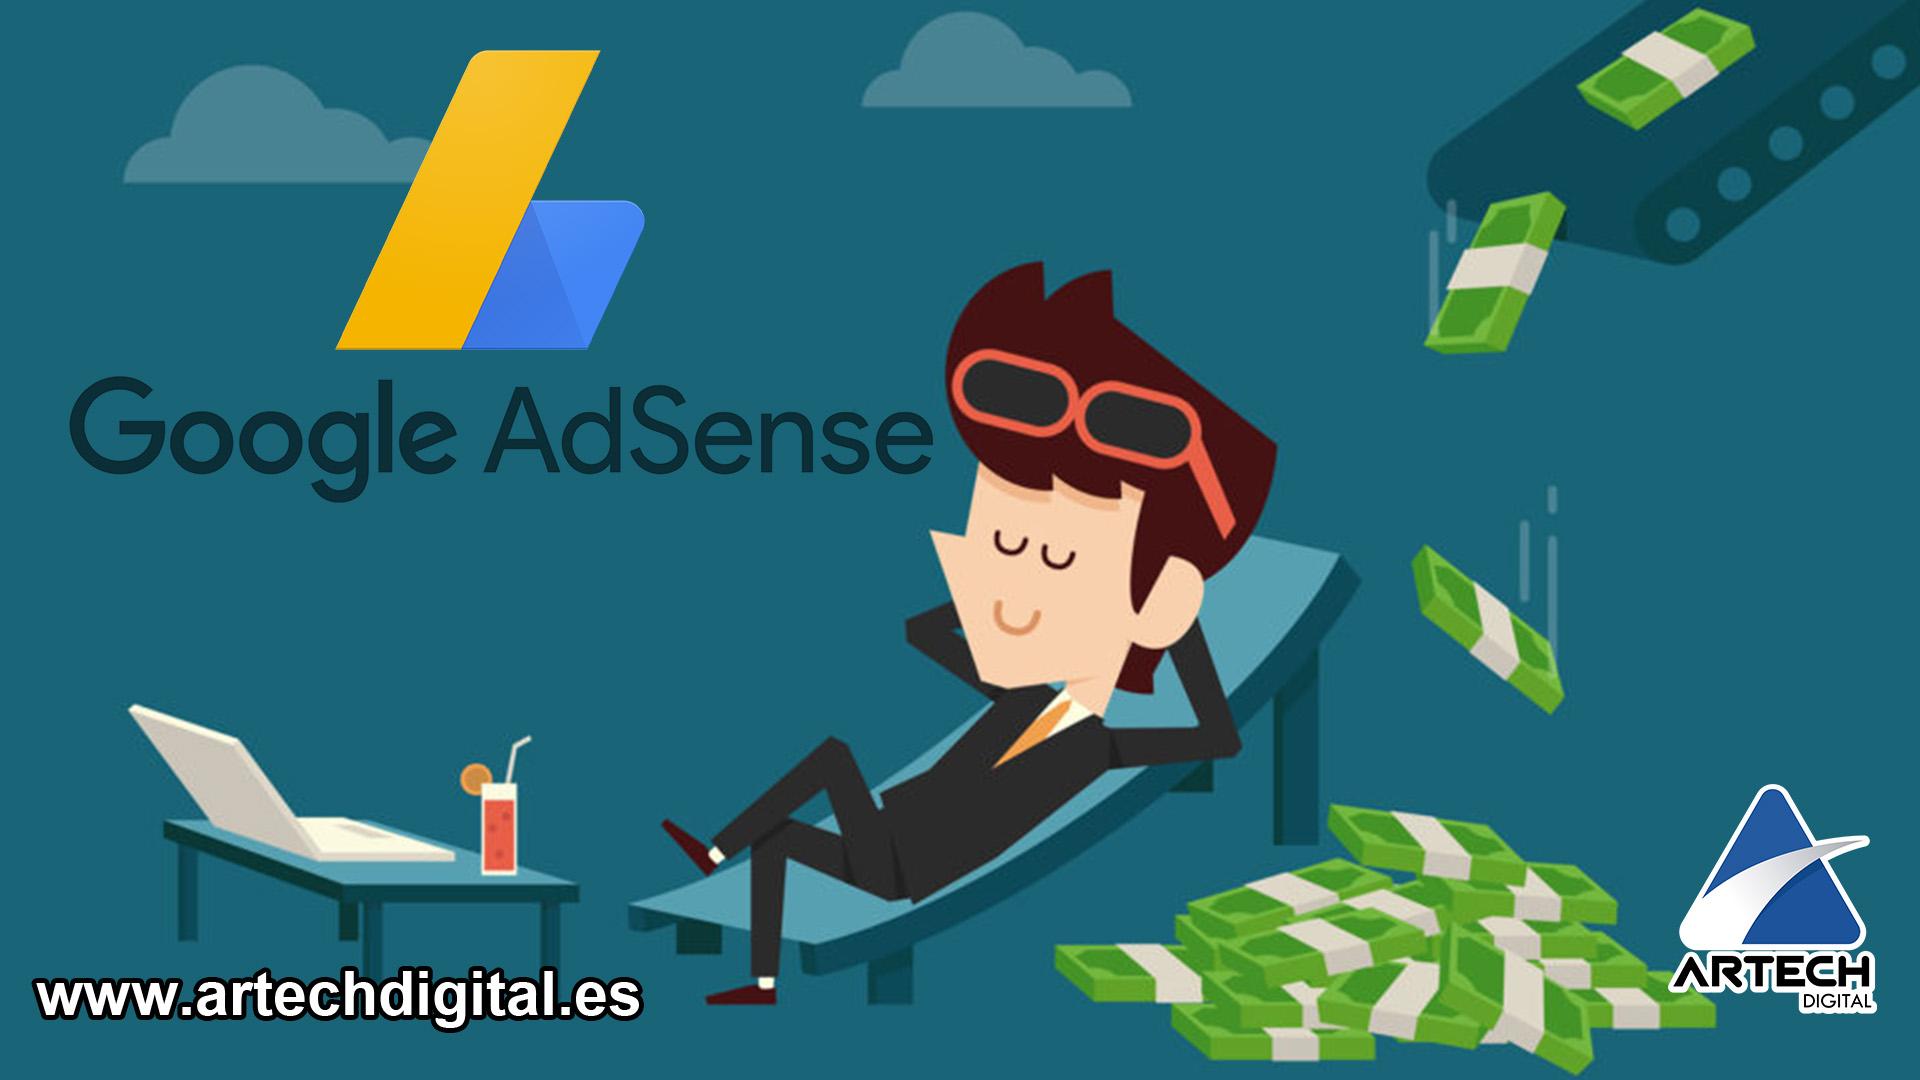 artechdigital - Google AdSense 1